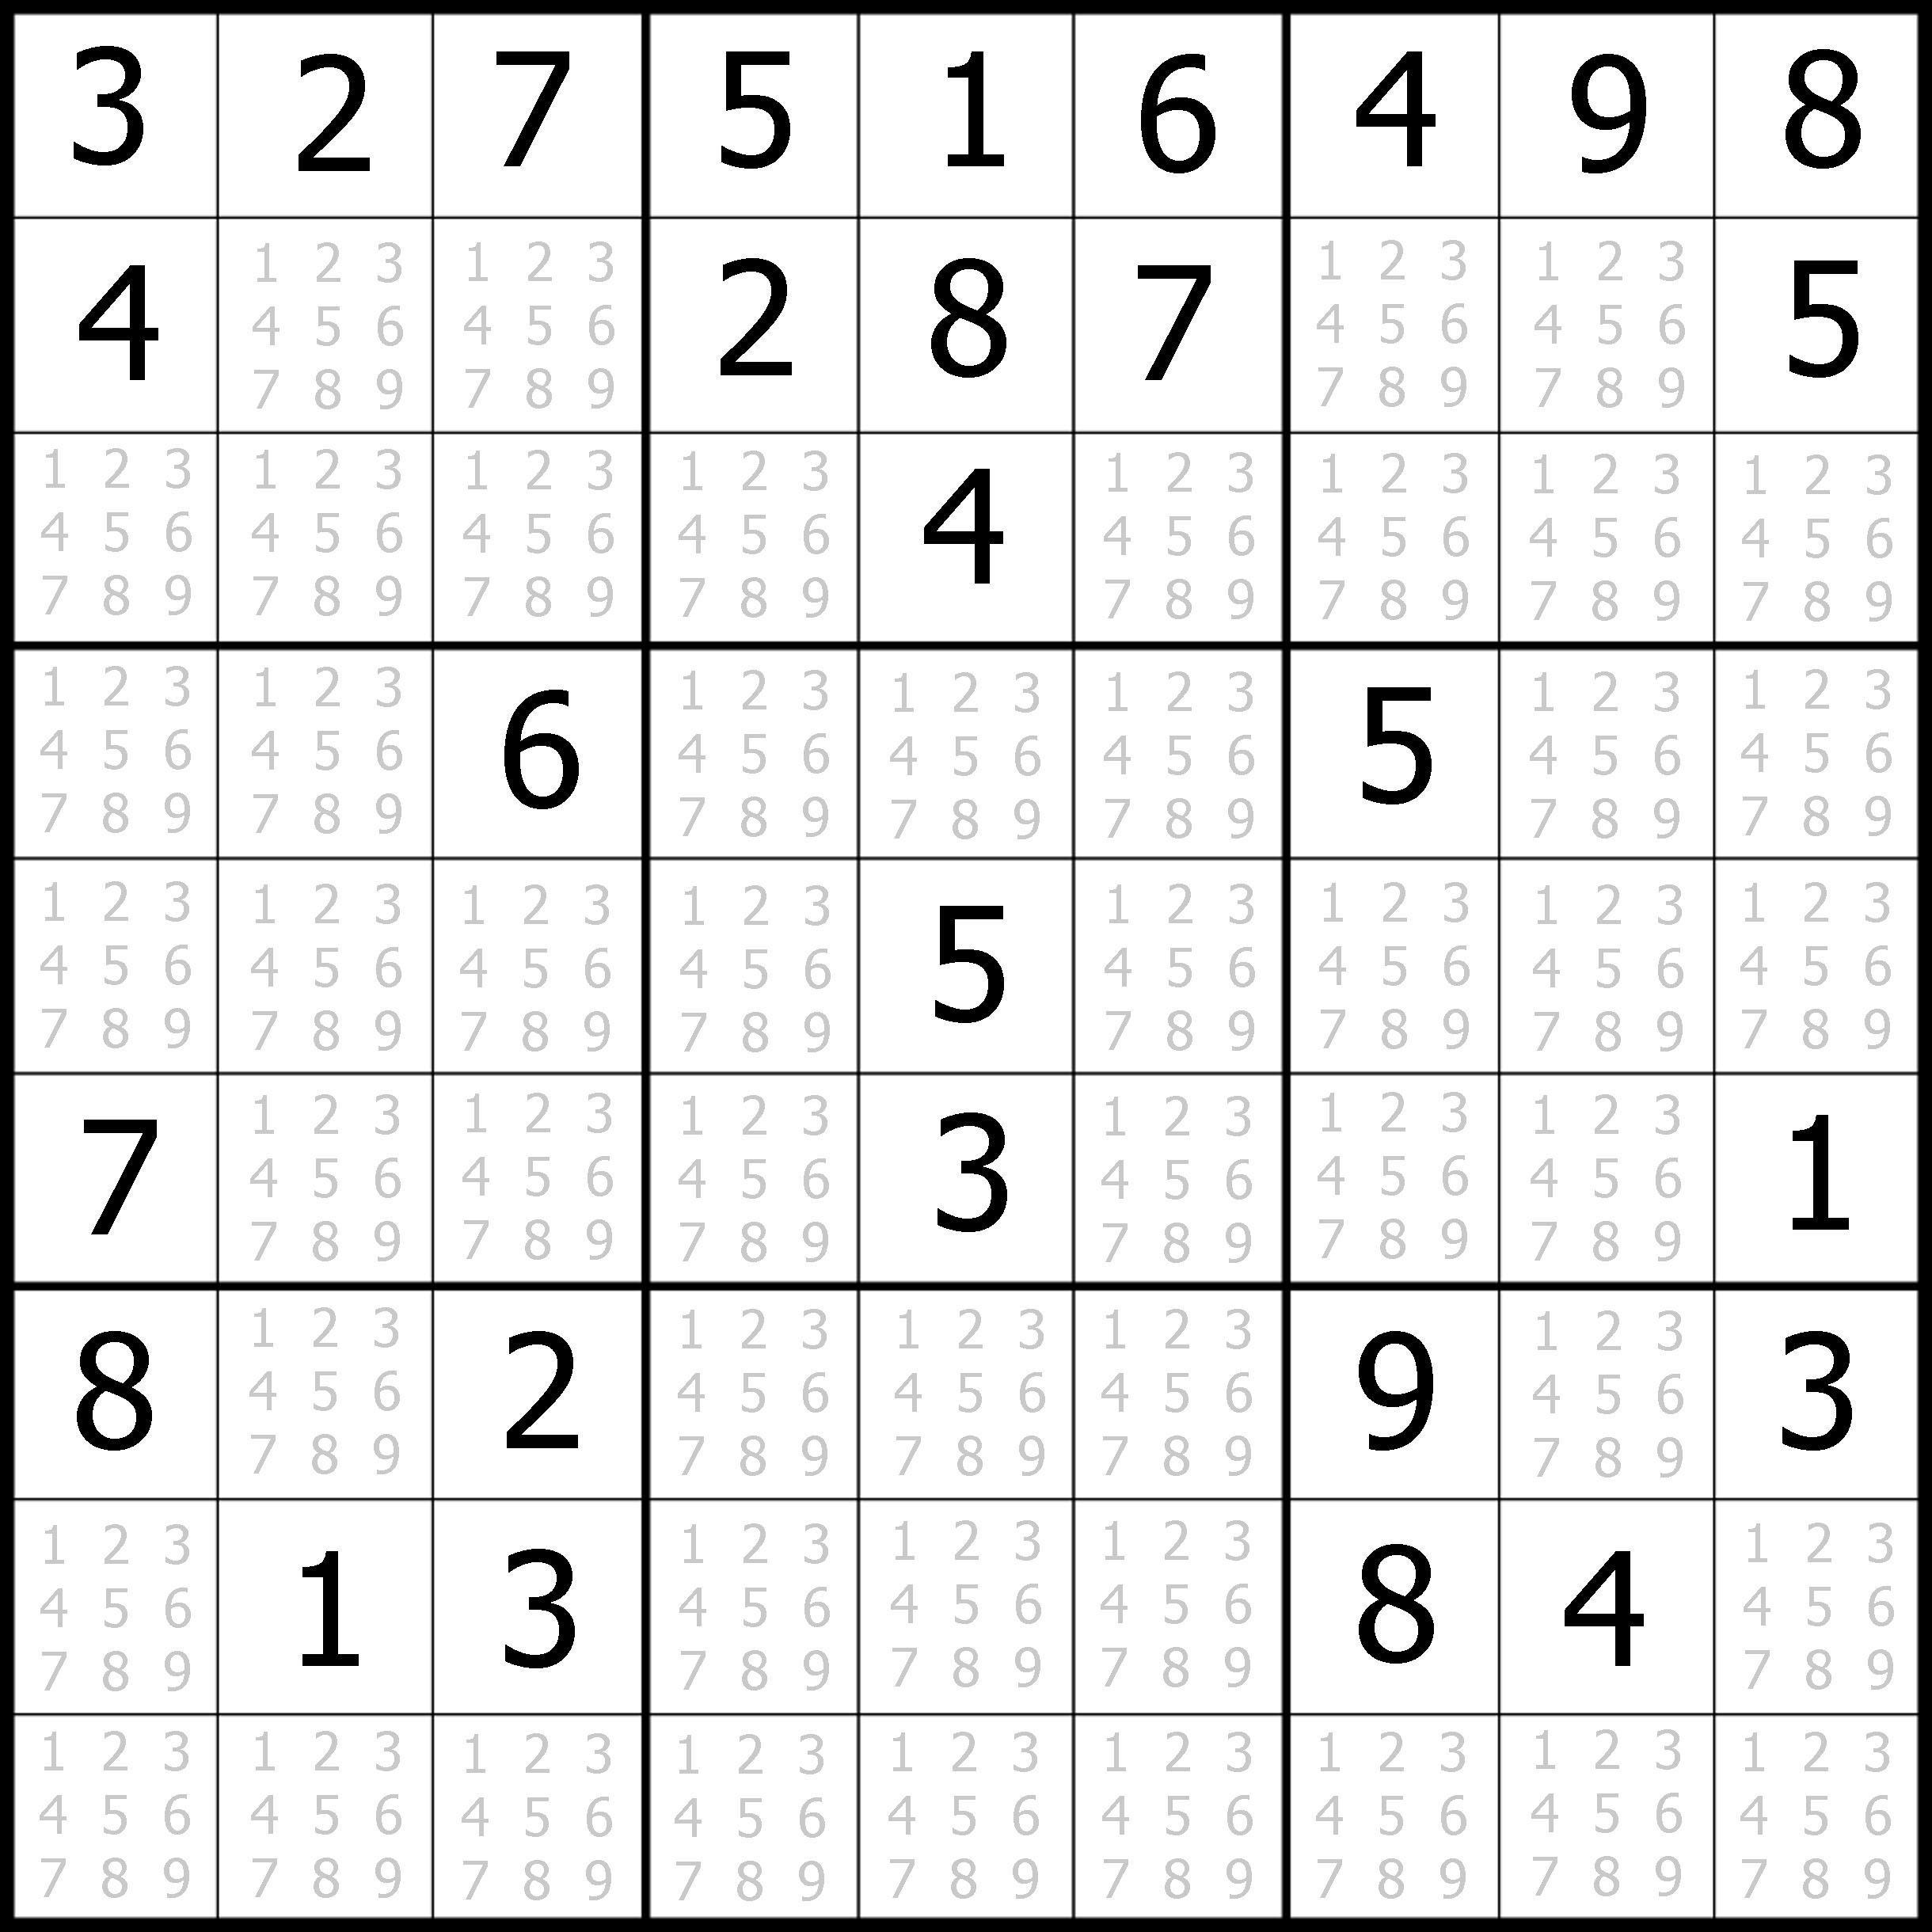 Fun Sudoku Worksheet | Printable Worksheets And Activities